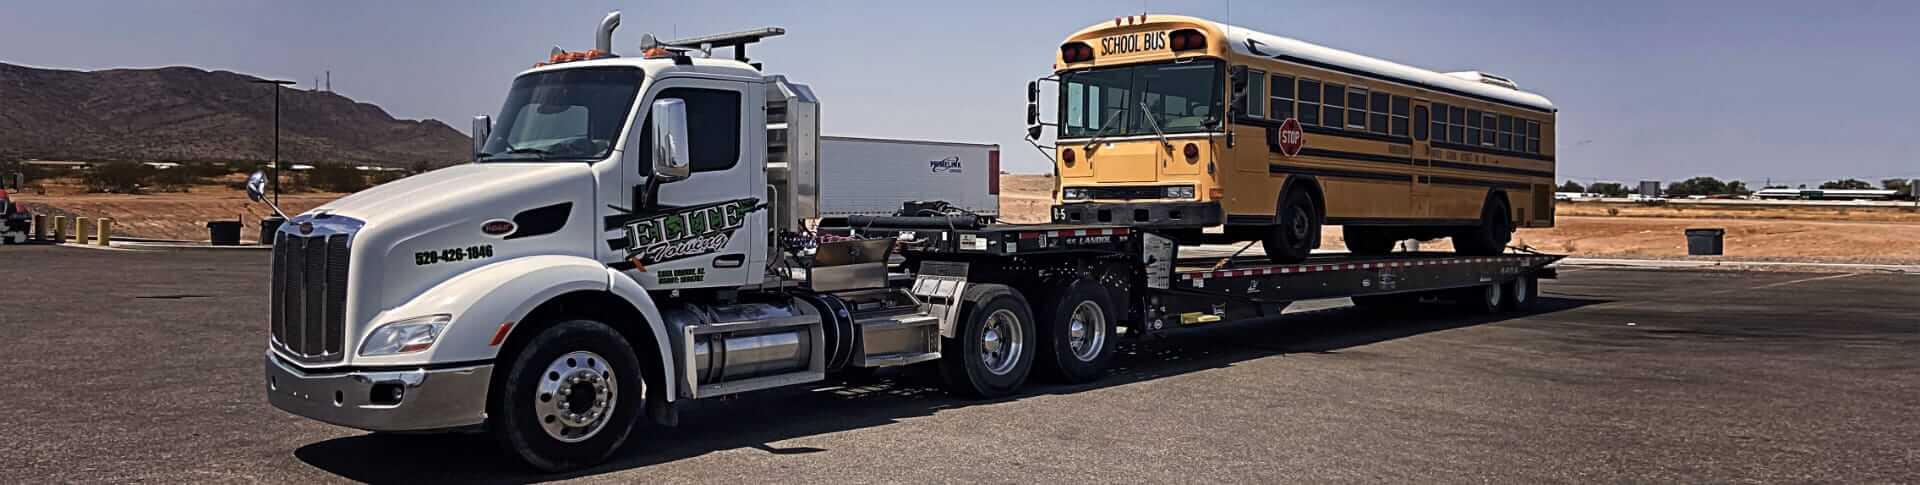 school bus towed by Elite Towing